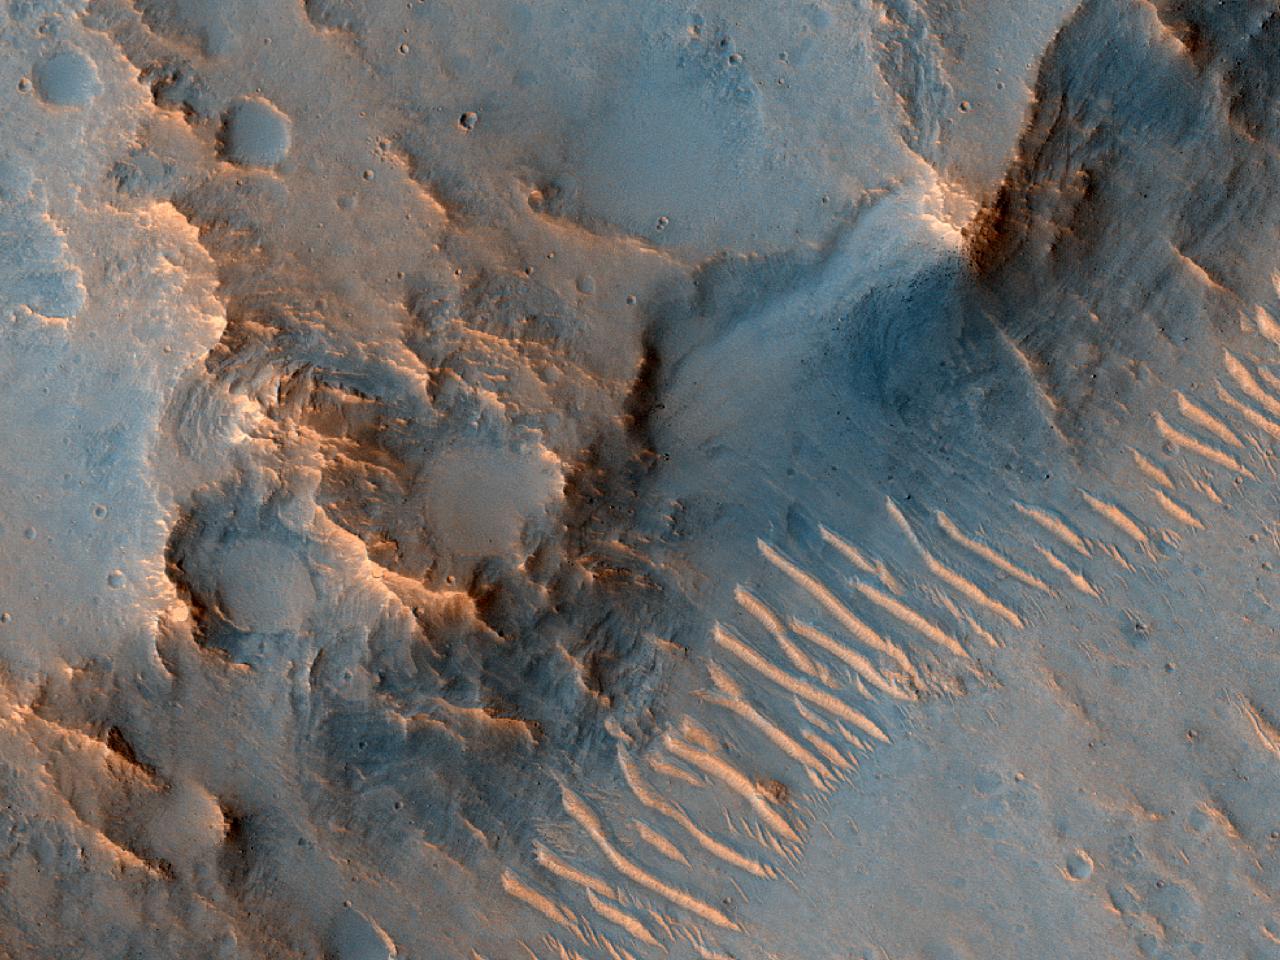 Ejecta Margin Near Ares Vallis